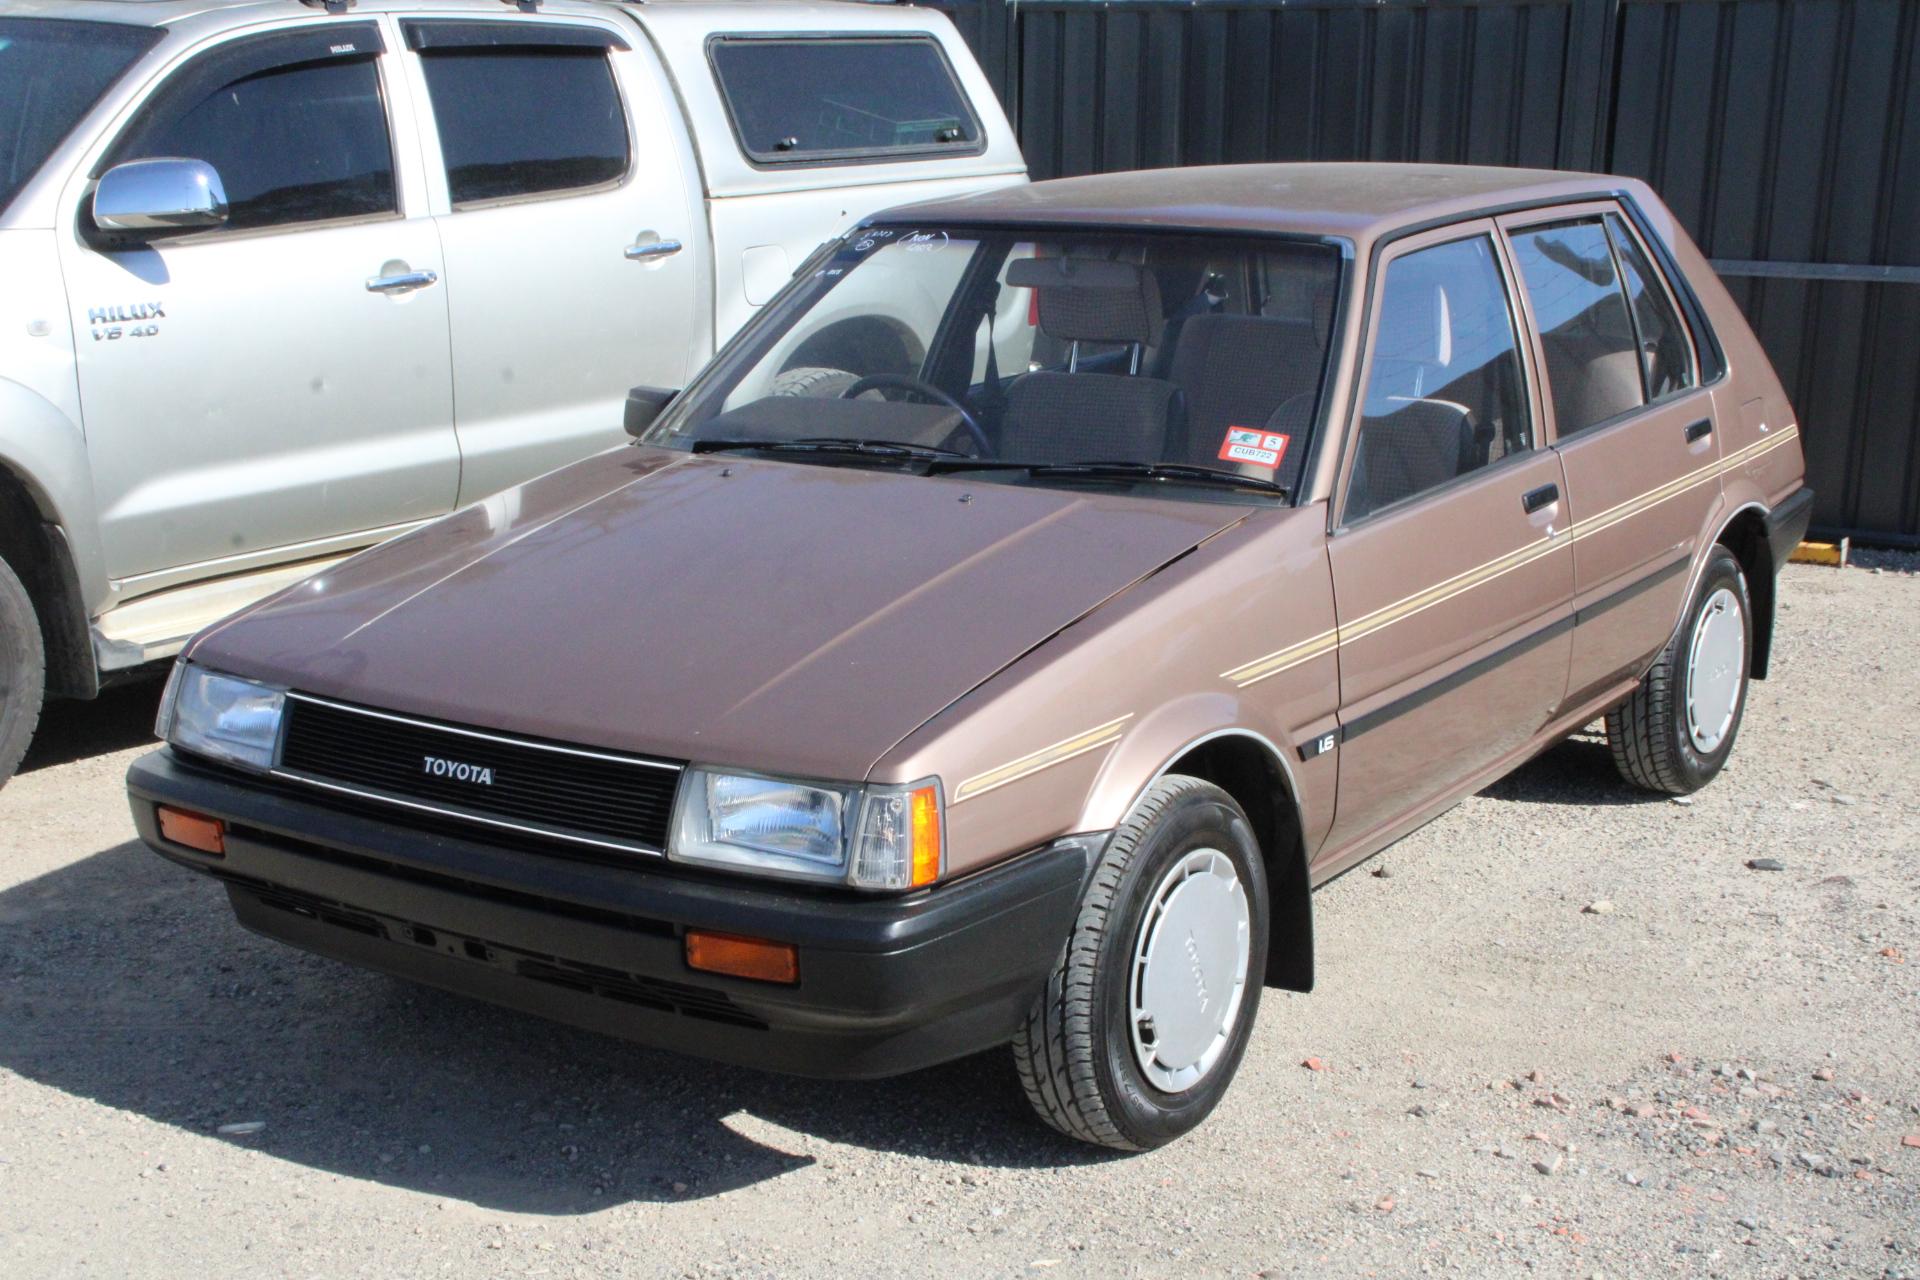 1986 Toyota Corolla Manual Hatchback